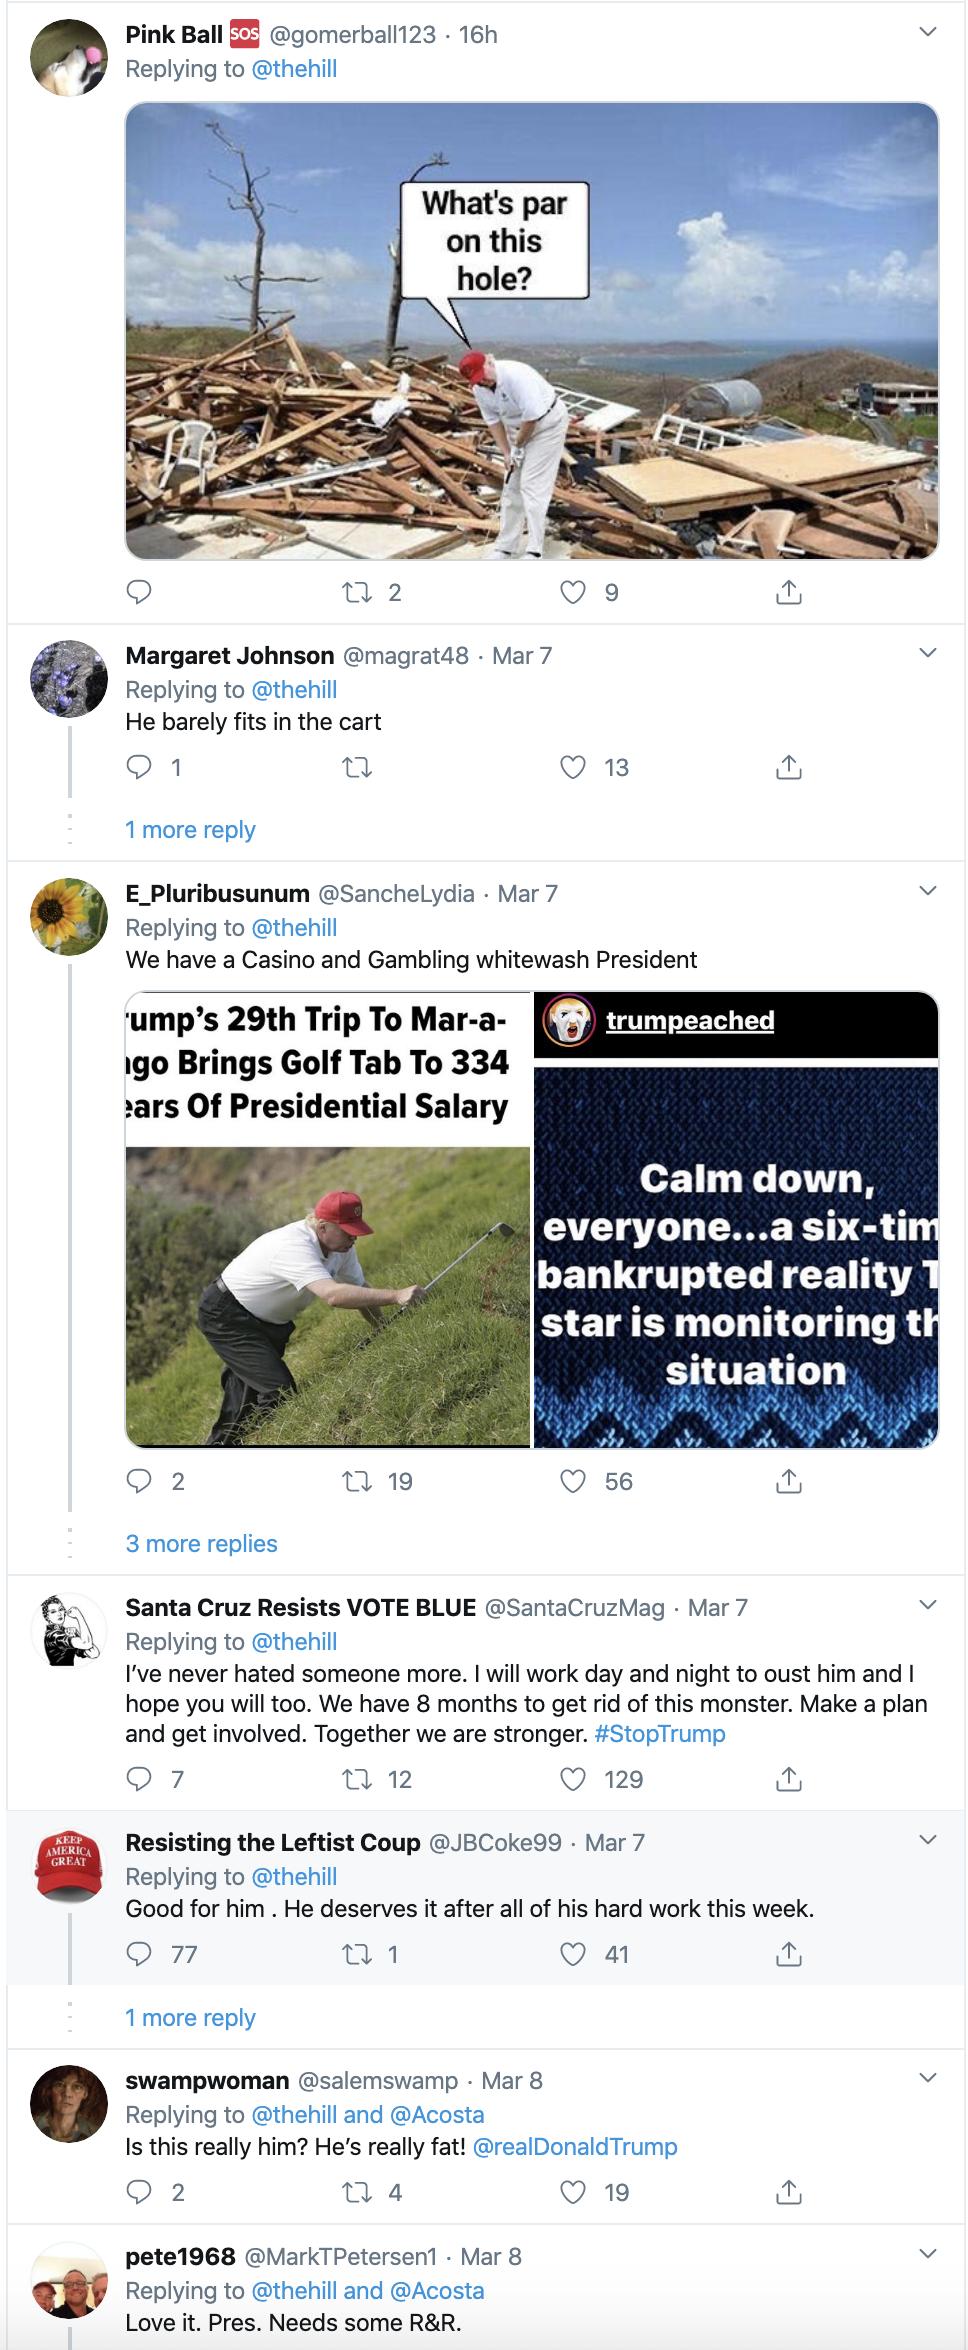 Screen-Shot-2020-03-09-at-10.10.19-AM Jim Cramer Defects From Trump & Blames Him For Coronavirus Response Economy Featured Politics Sports Top Stories